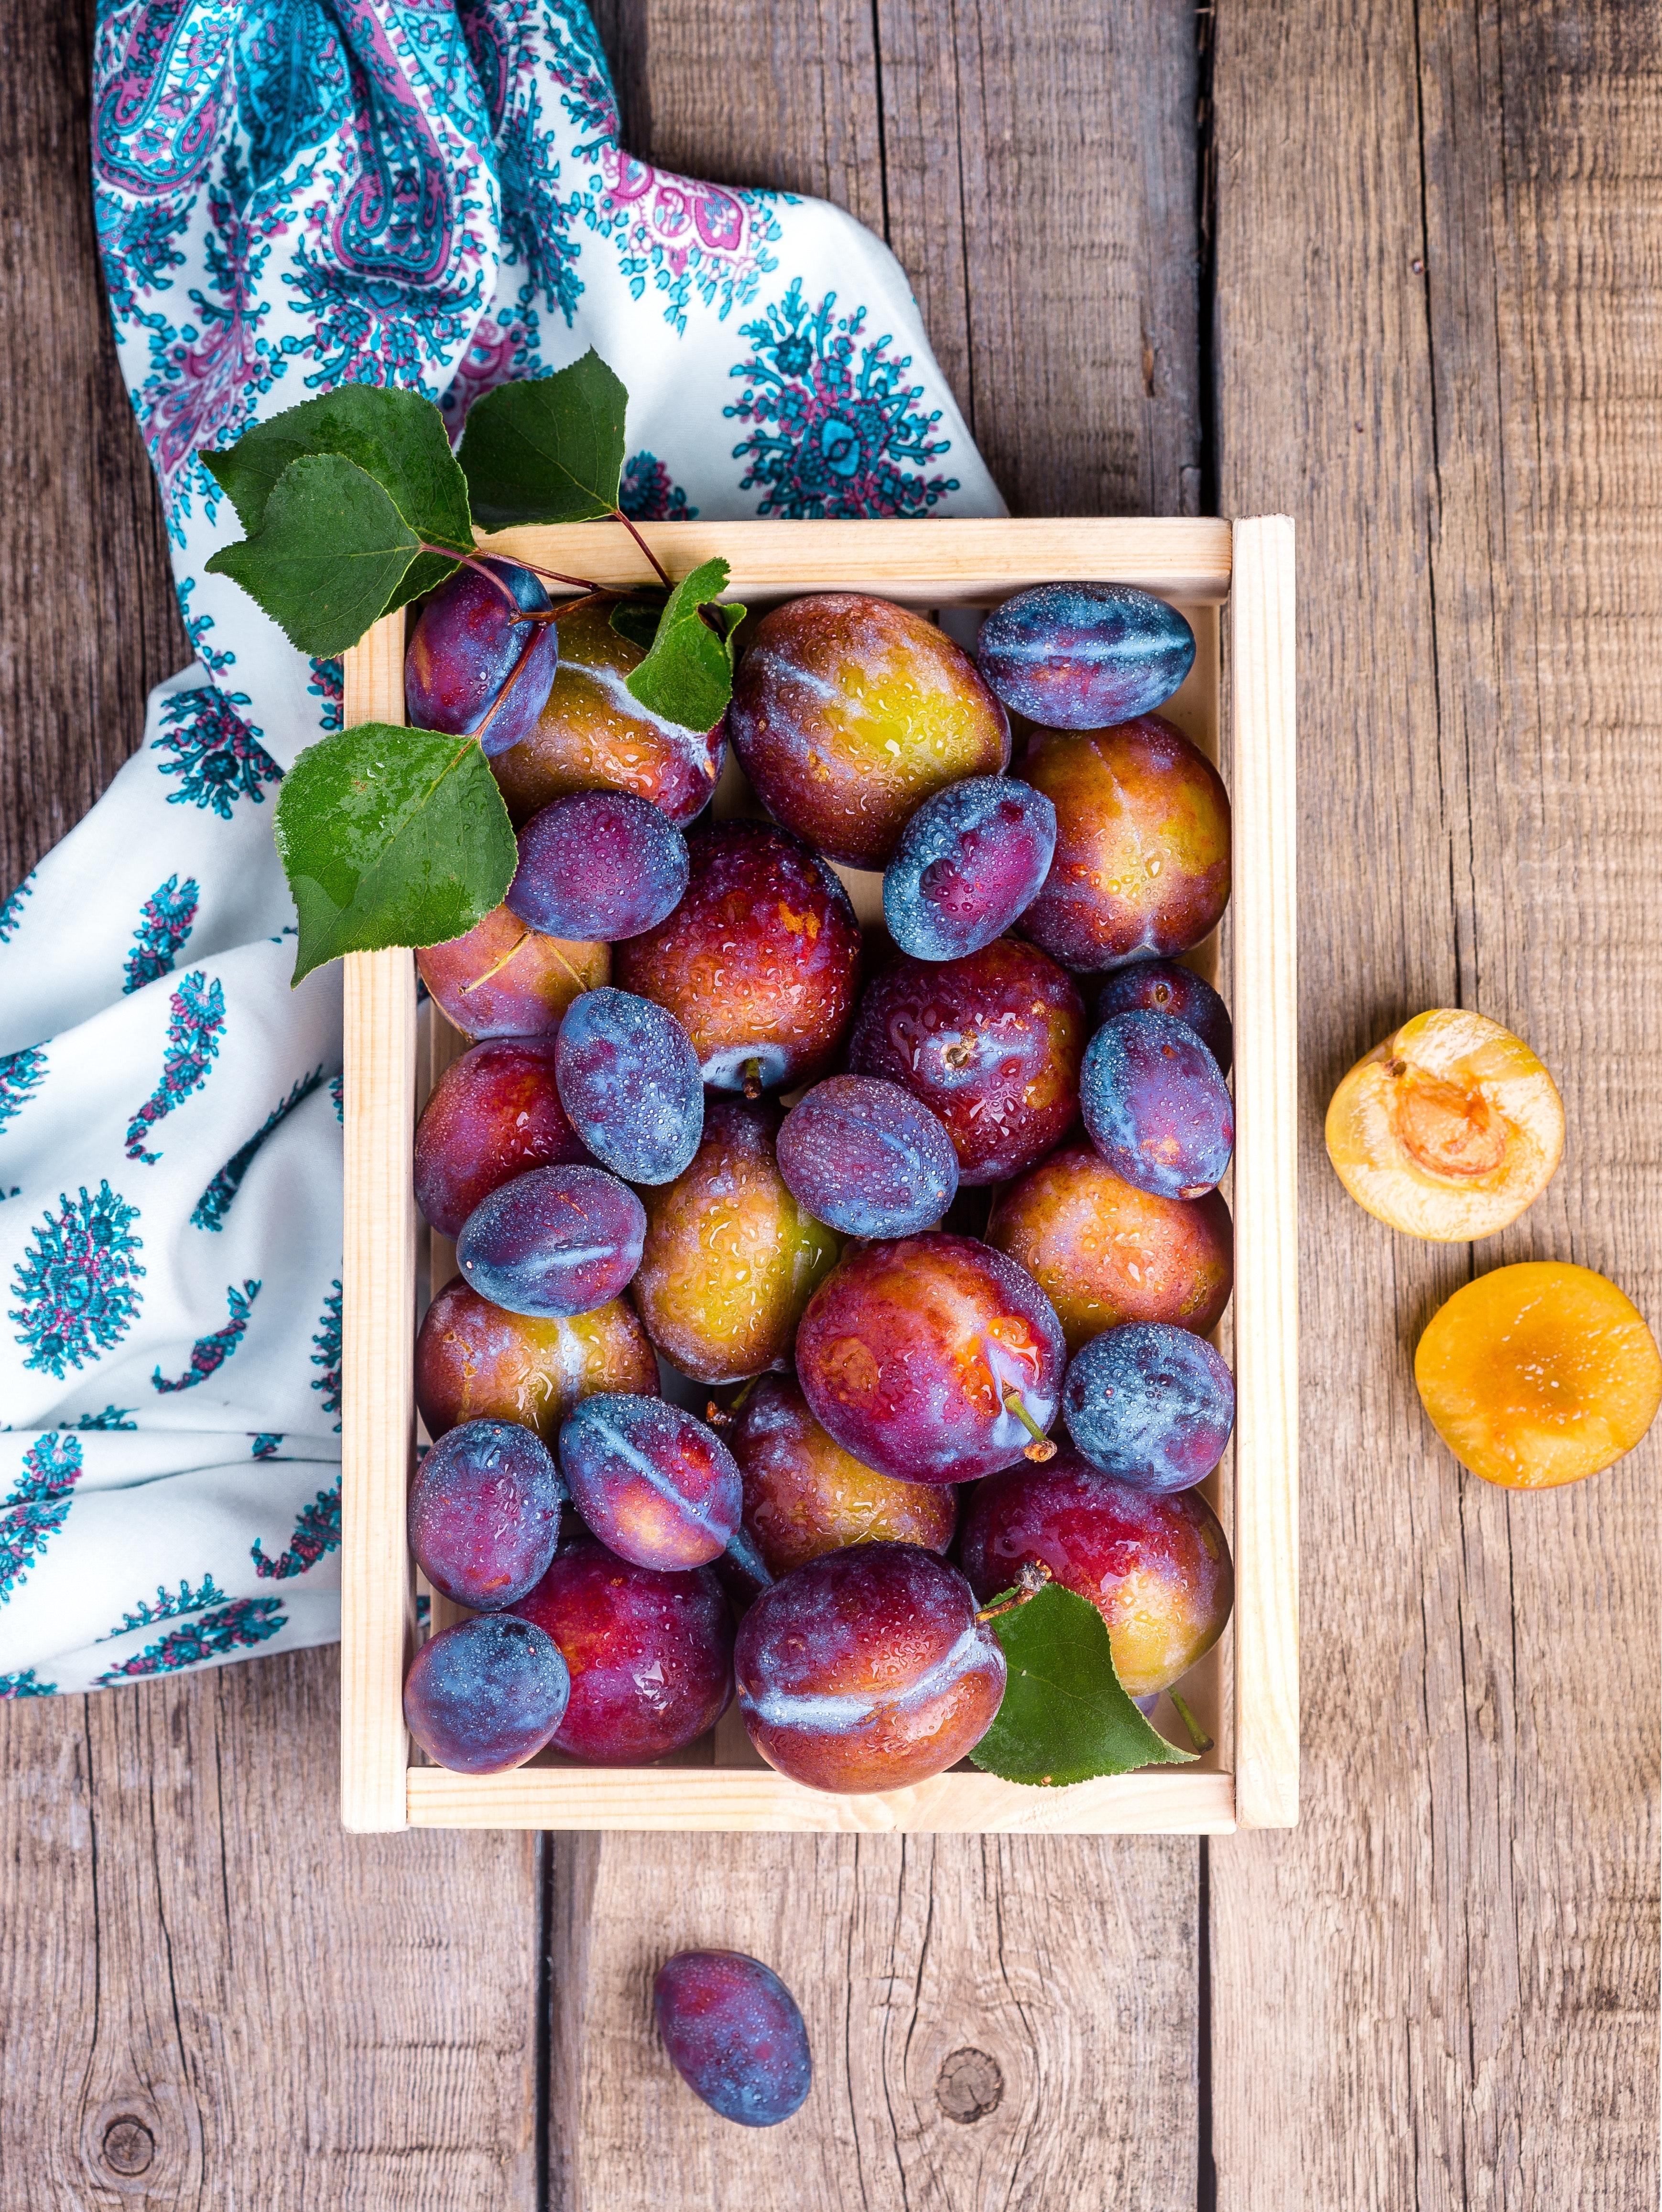 Full Frame Shot of Fruits and Tree, Box, High angle shot, Vitamins, Sweet, HQ Photo